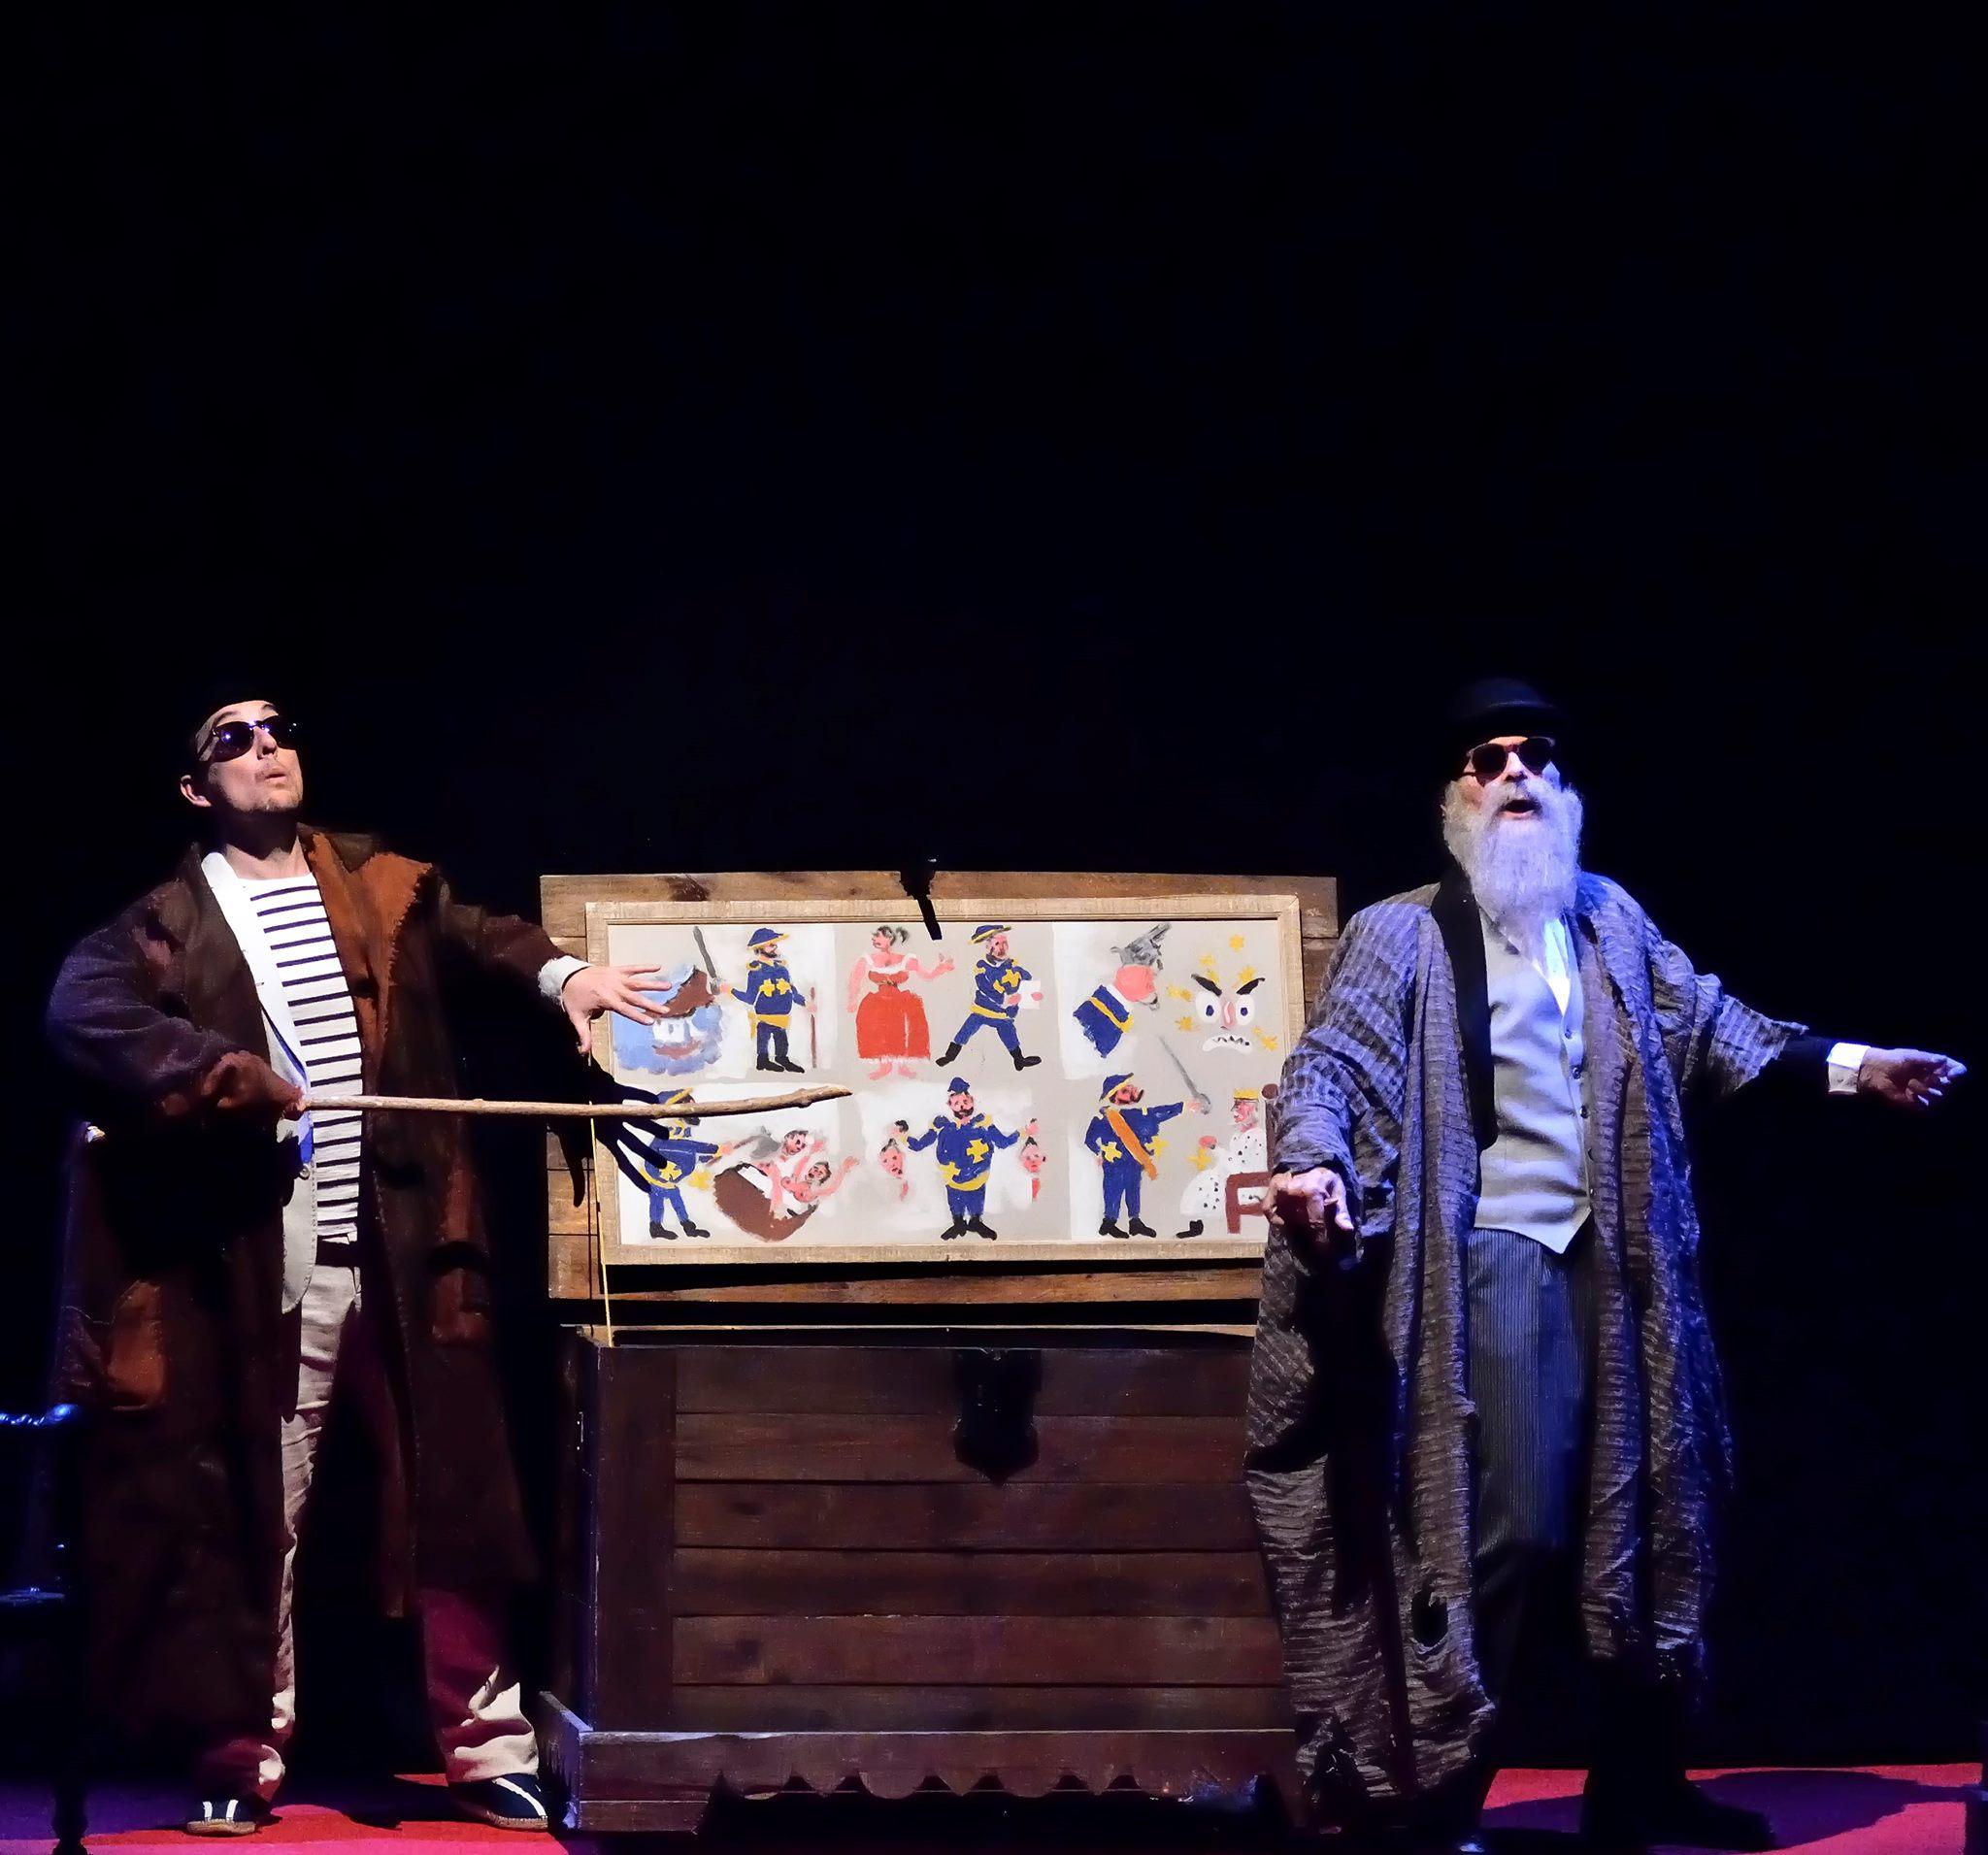 Teatro À(s) Quinta(s) - 'Diálogo de Sombras' -Tranvía Teatro